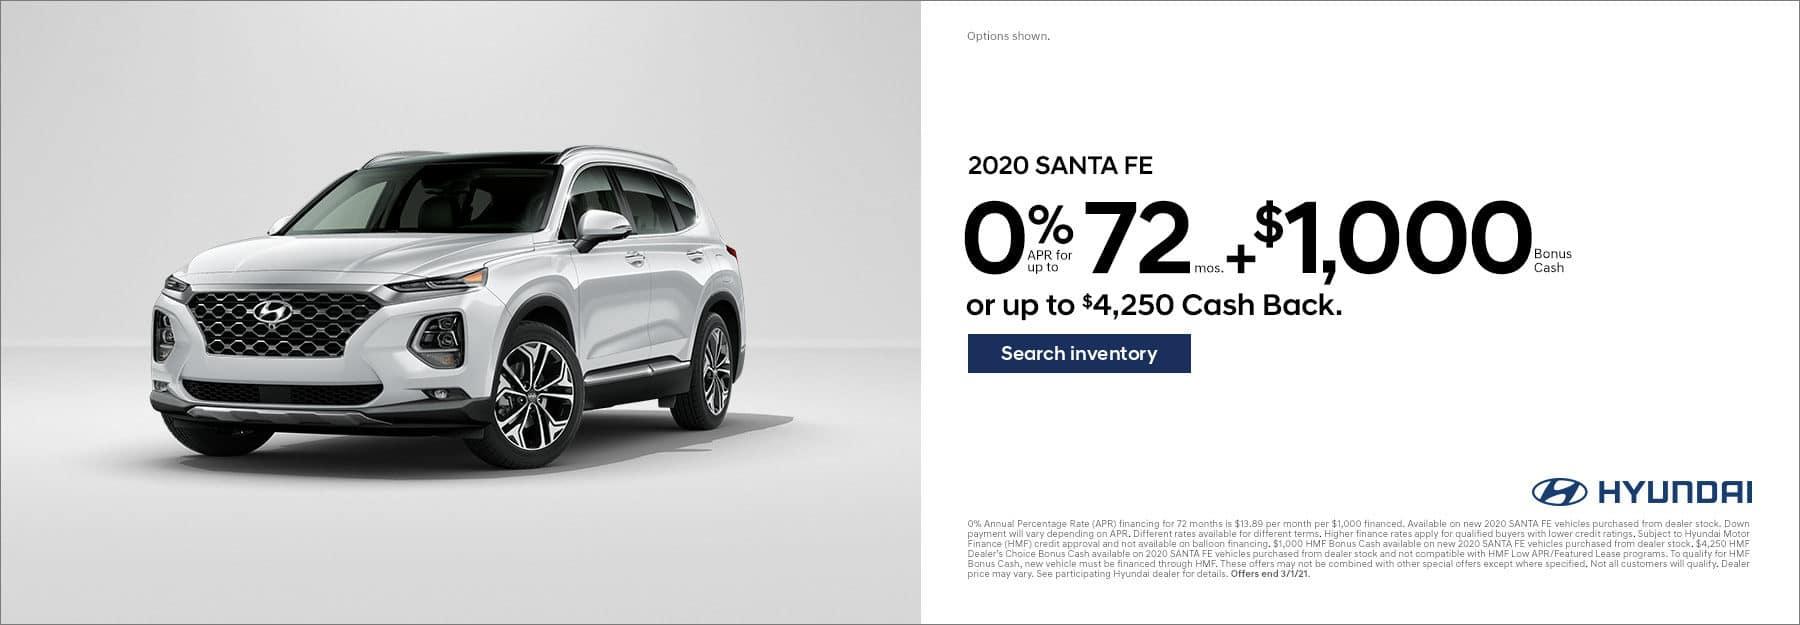 0% for 72 months Santa Fe